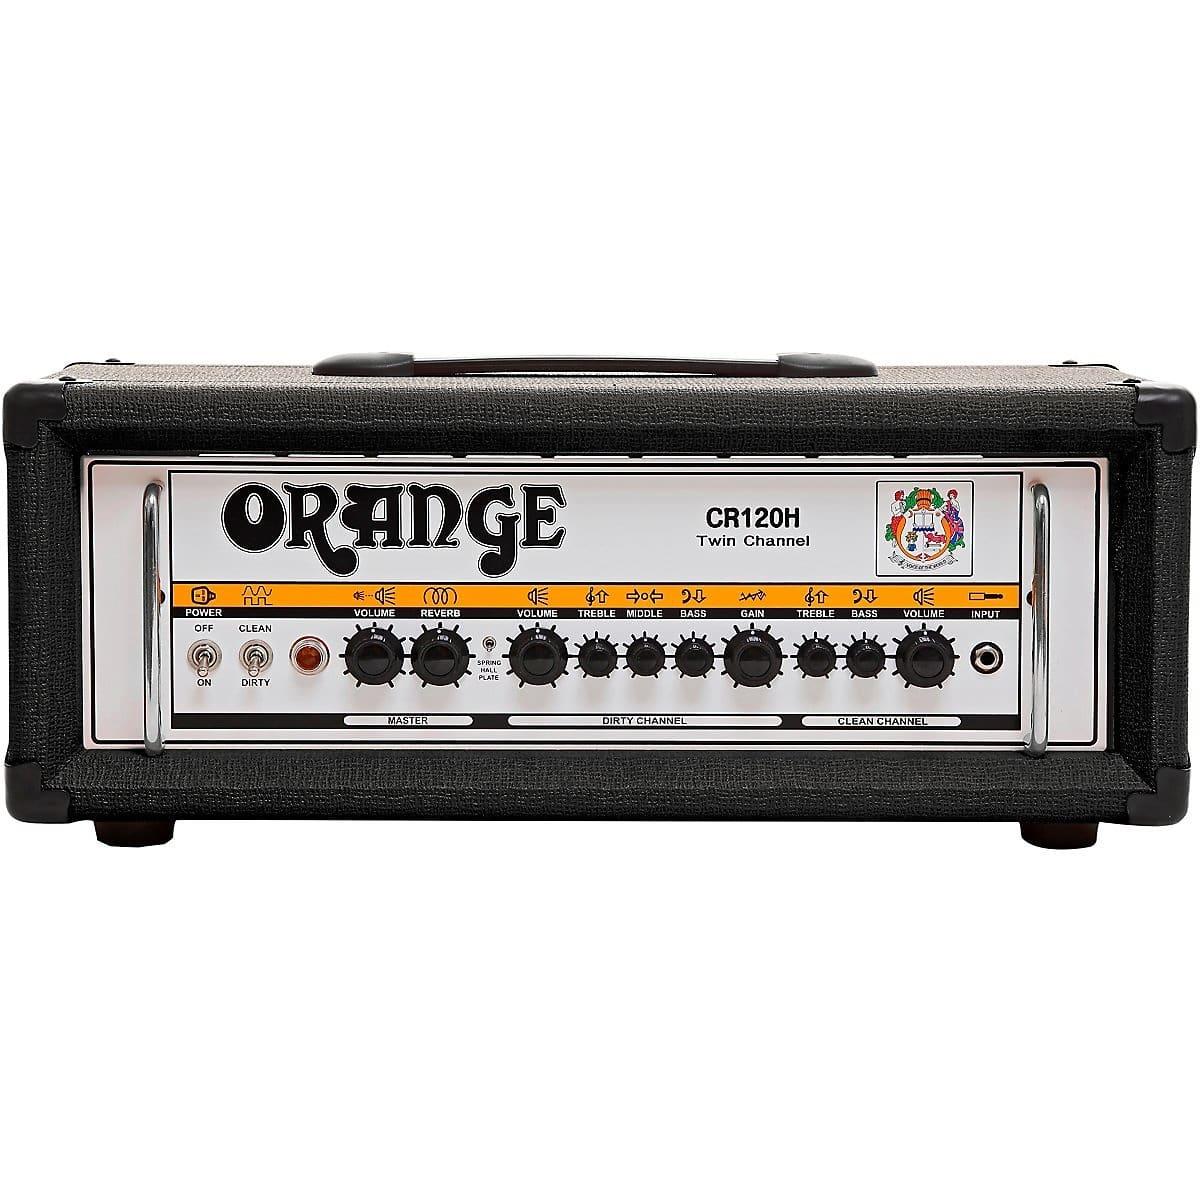 orange amplifiers crush pro cr120h 120w guitar amp head black reverb. Black Bedroom Furniture Sets. Home Design Ideas